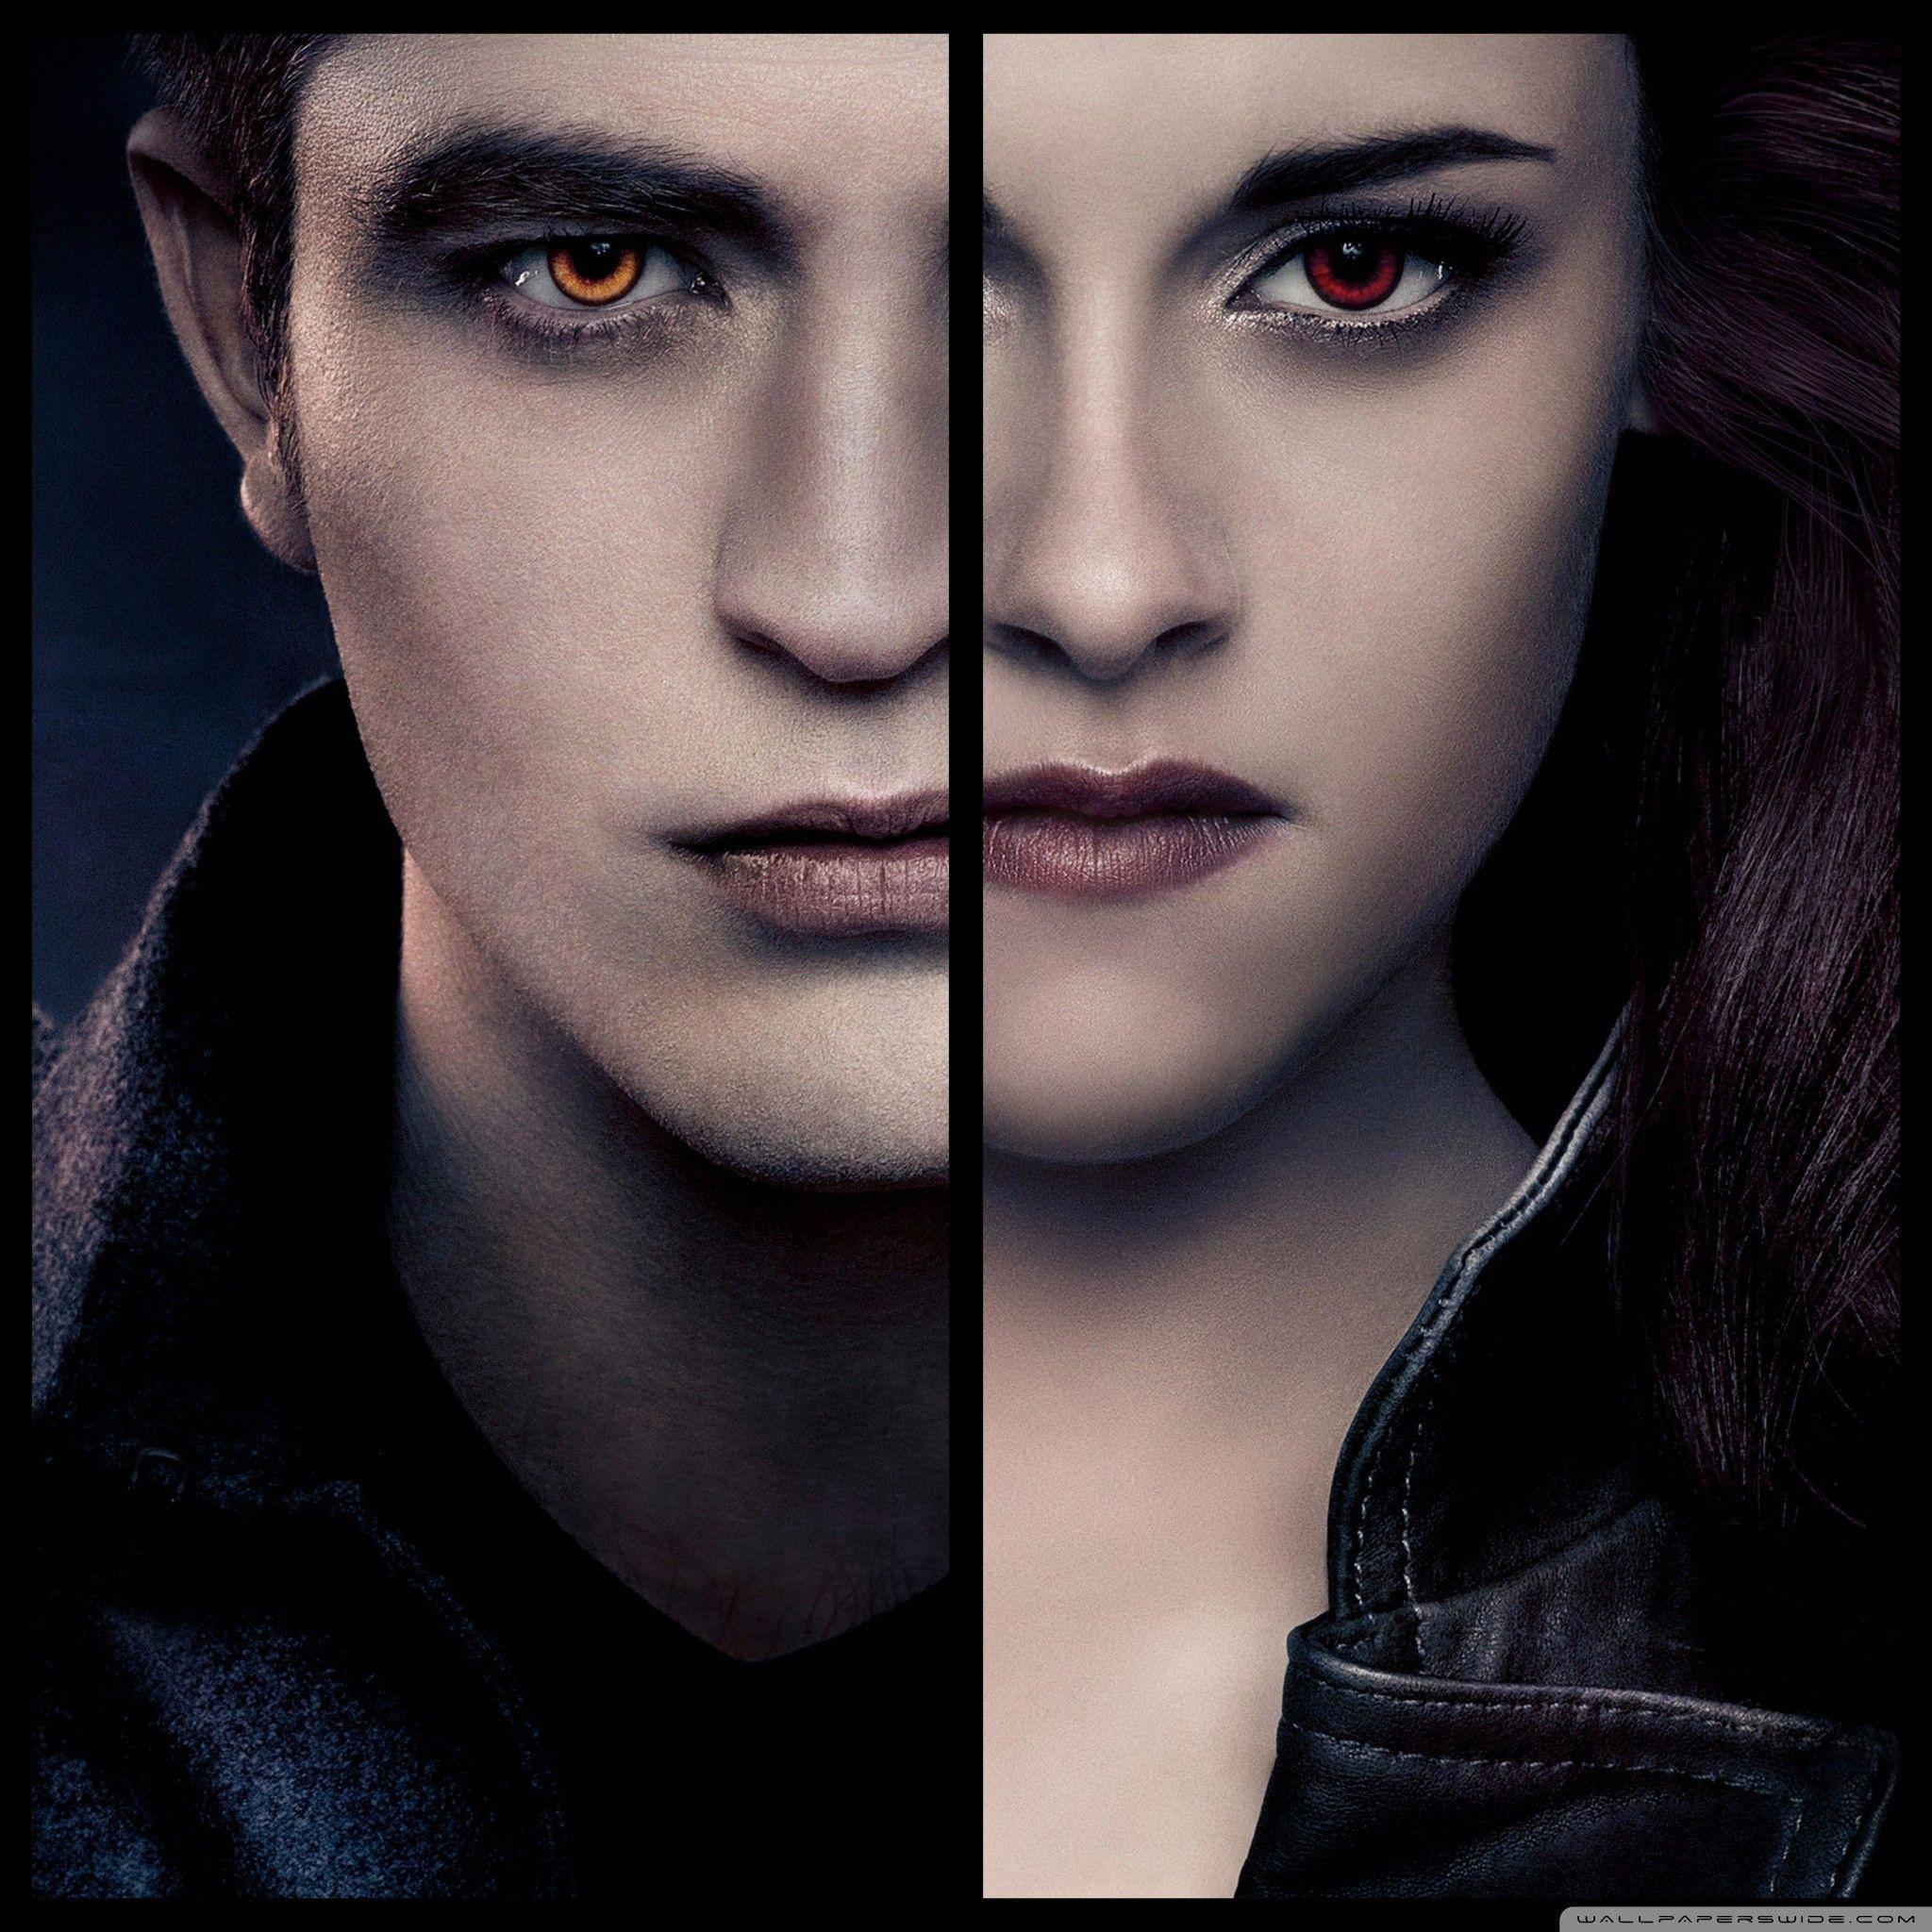 Магия вампиров | вампирократия